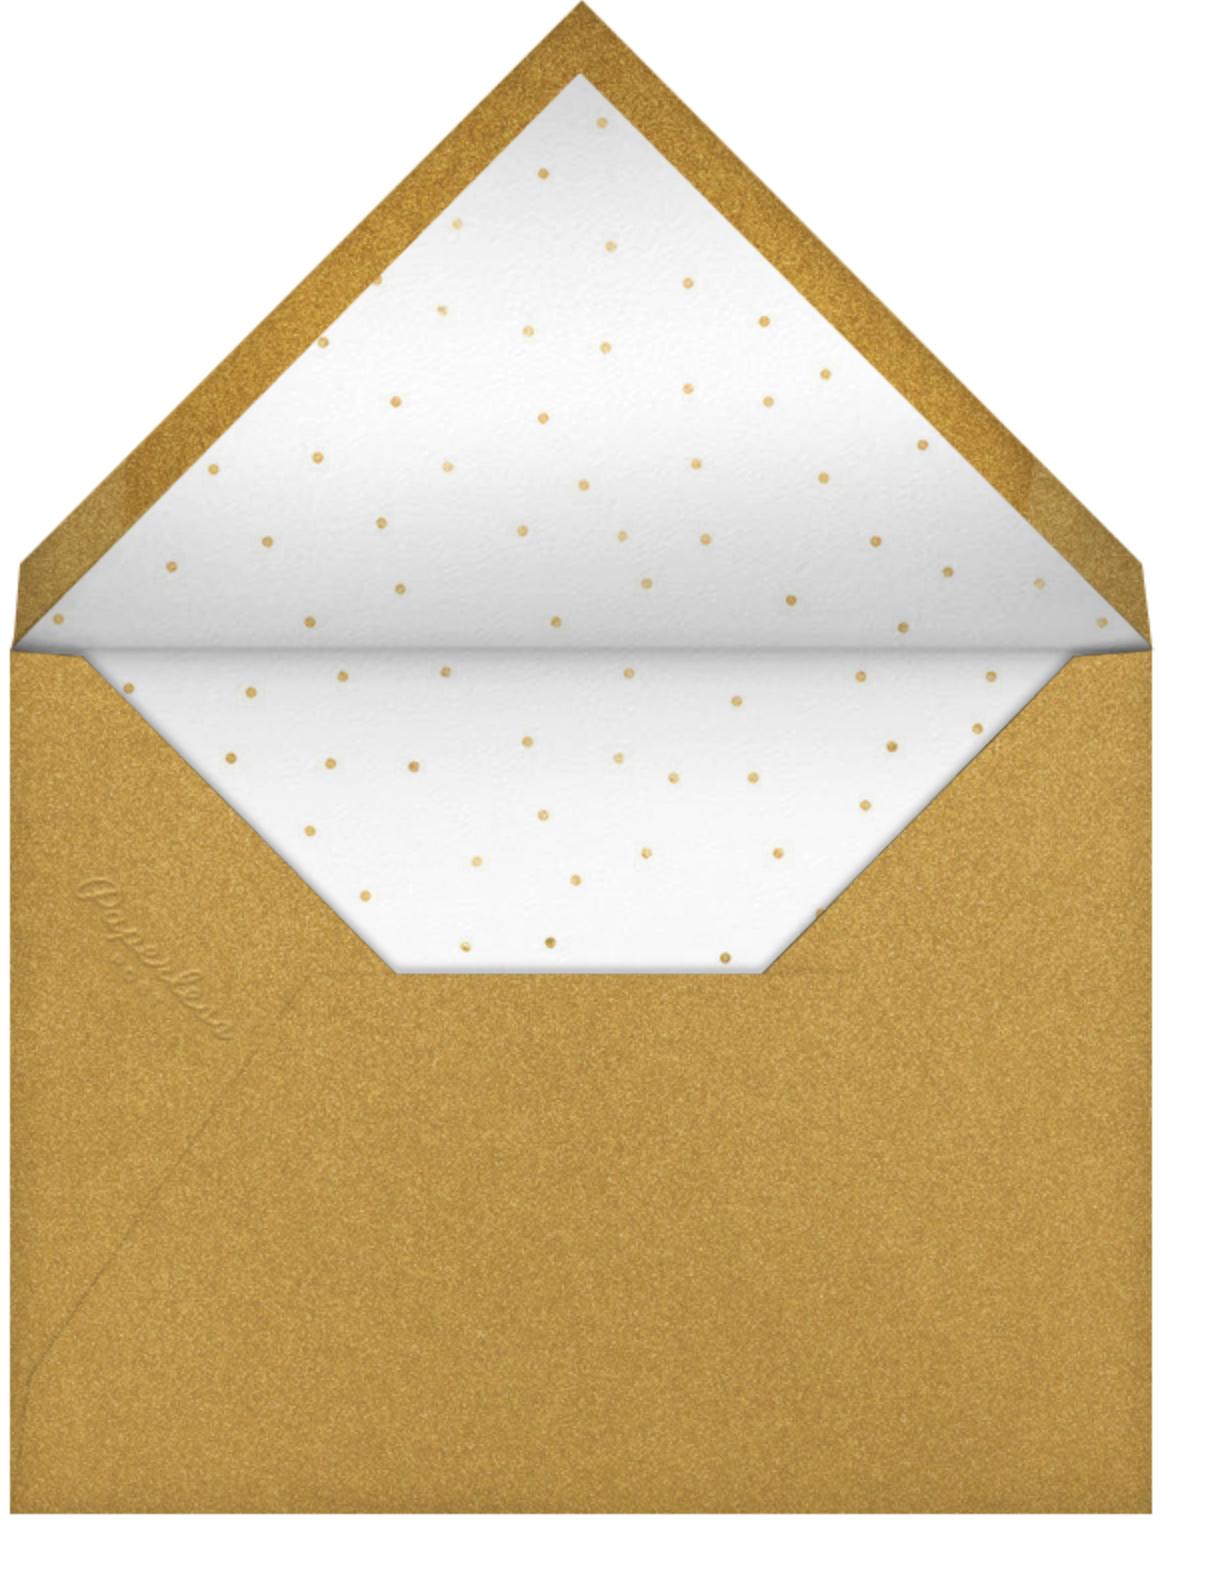 Almaviva Photo - We're Open - Paperless Post - Professional events - envelope back